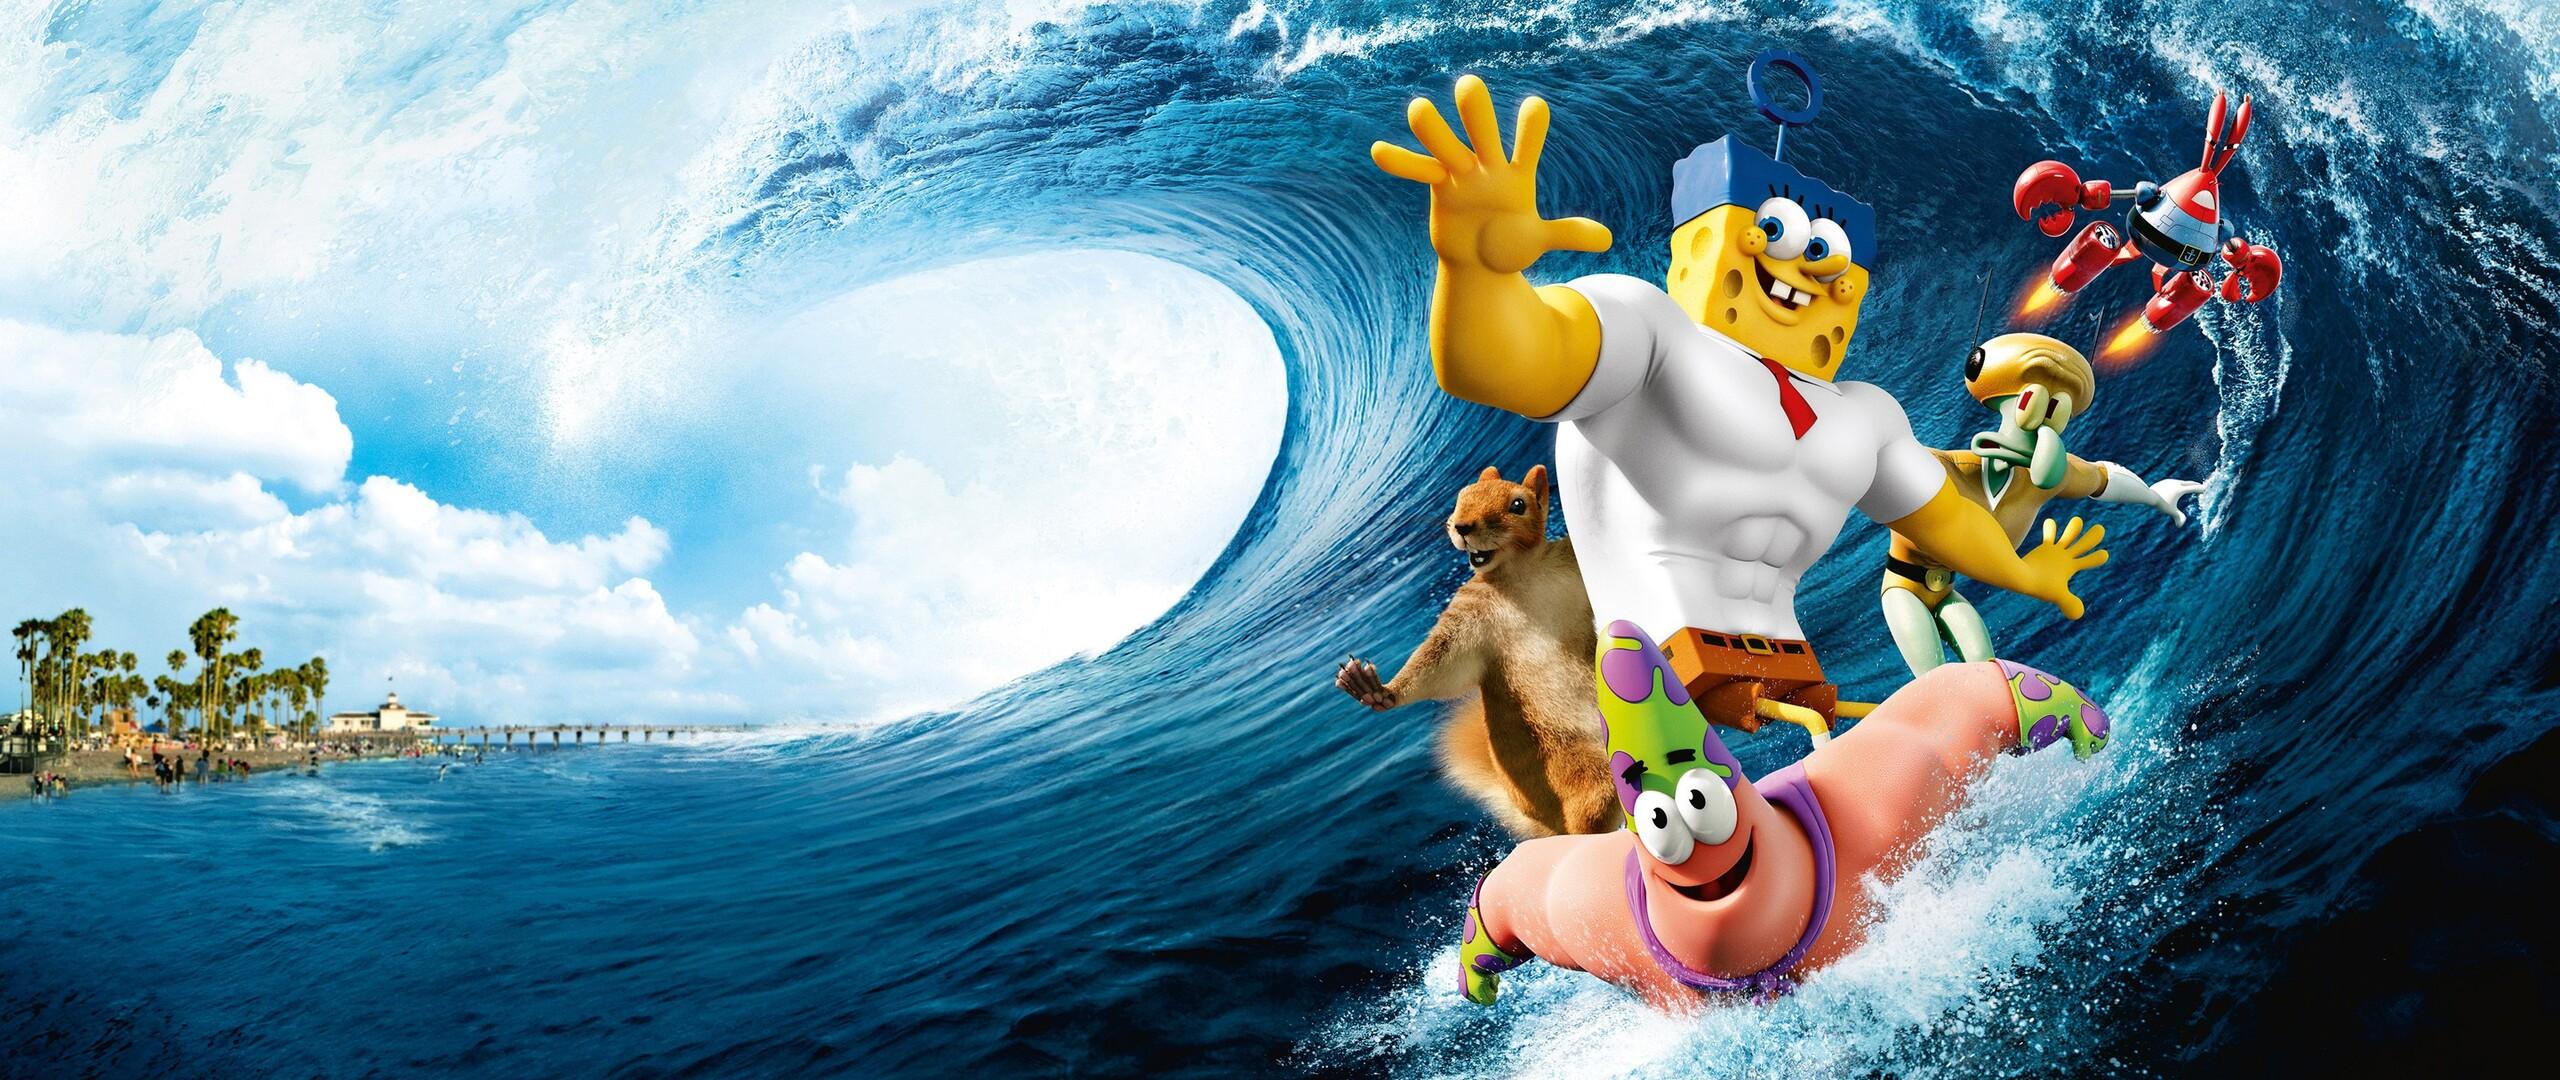 the-spongebob-movie.jpg